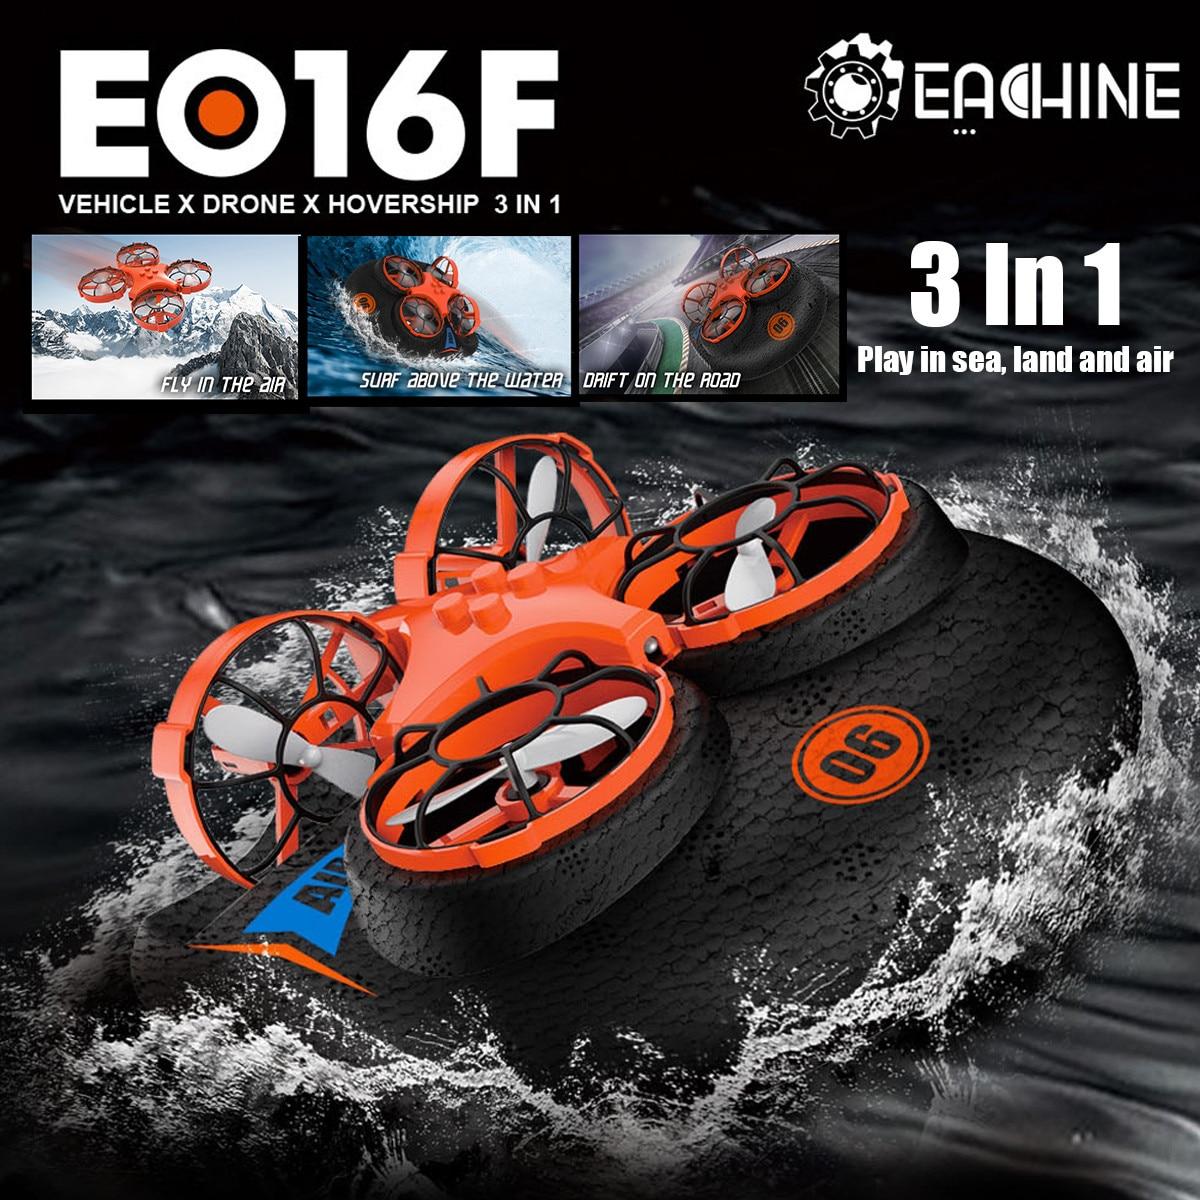 Eachine E016F 3-in-1 EPP Flying Air Boat Land Driving Mode Detachable One Key Return RC Quadcopter RTF